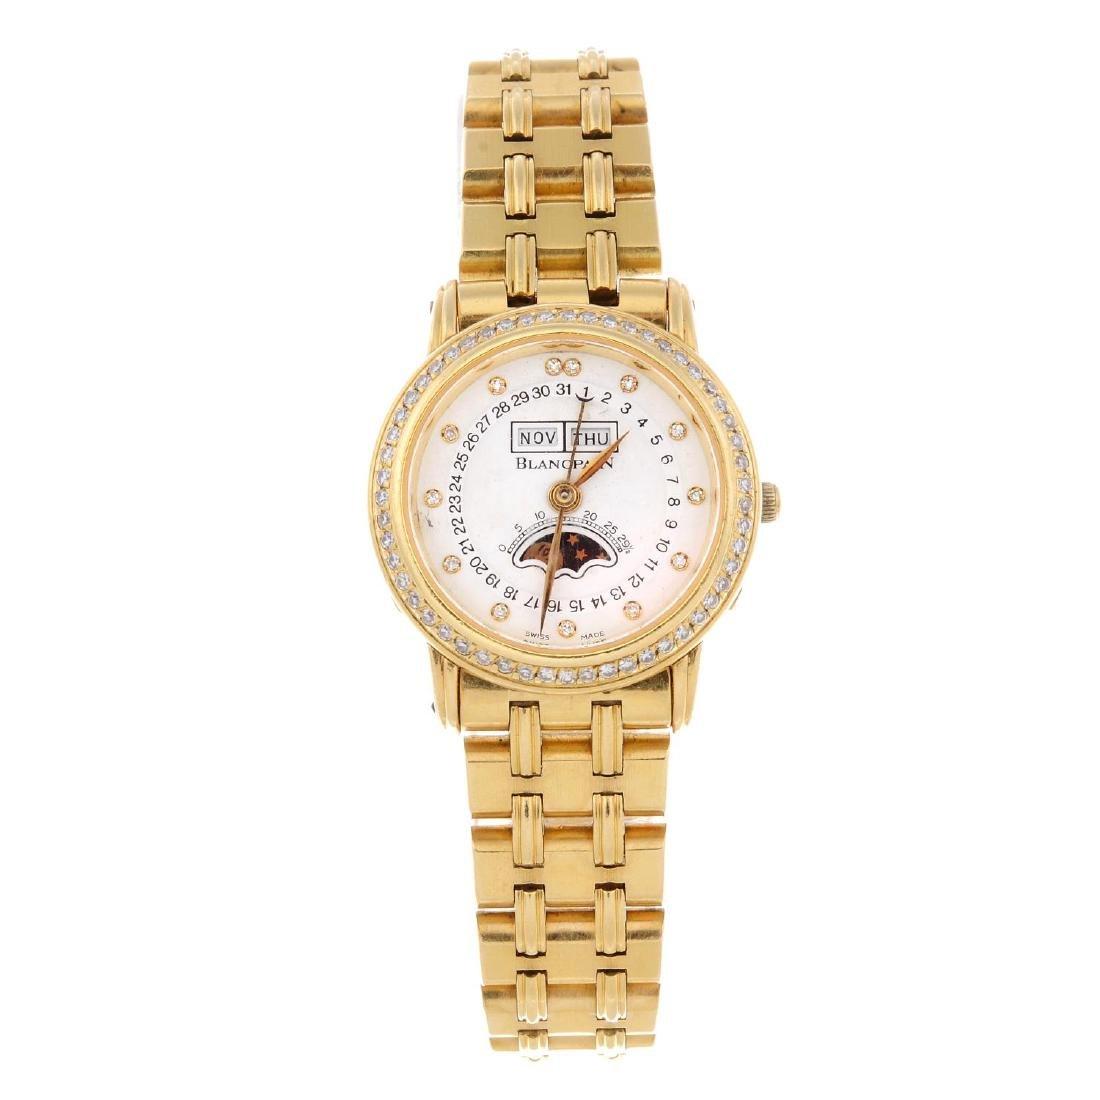 BLANCPAIN - a lady's bracelet watch. 18ct yellow gold